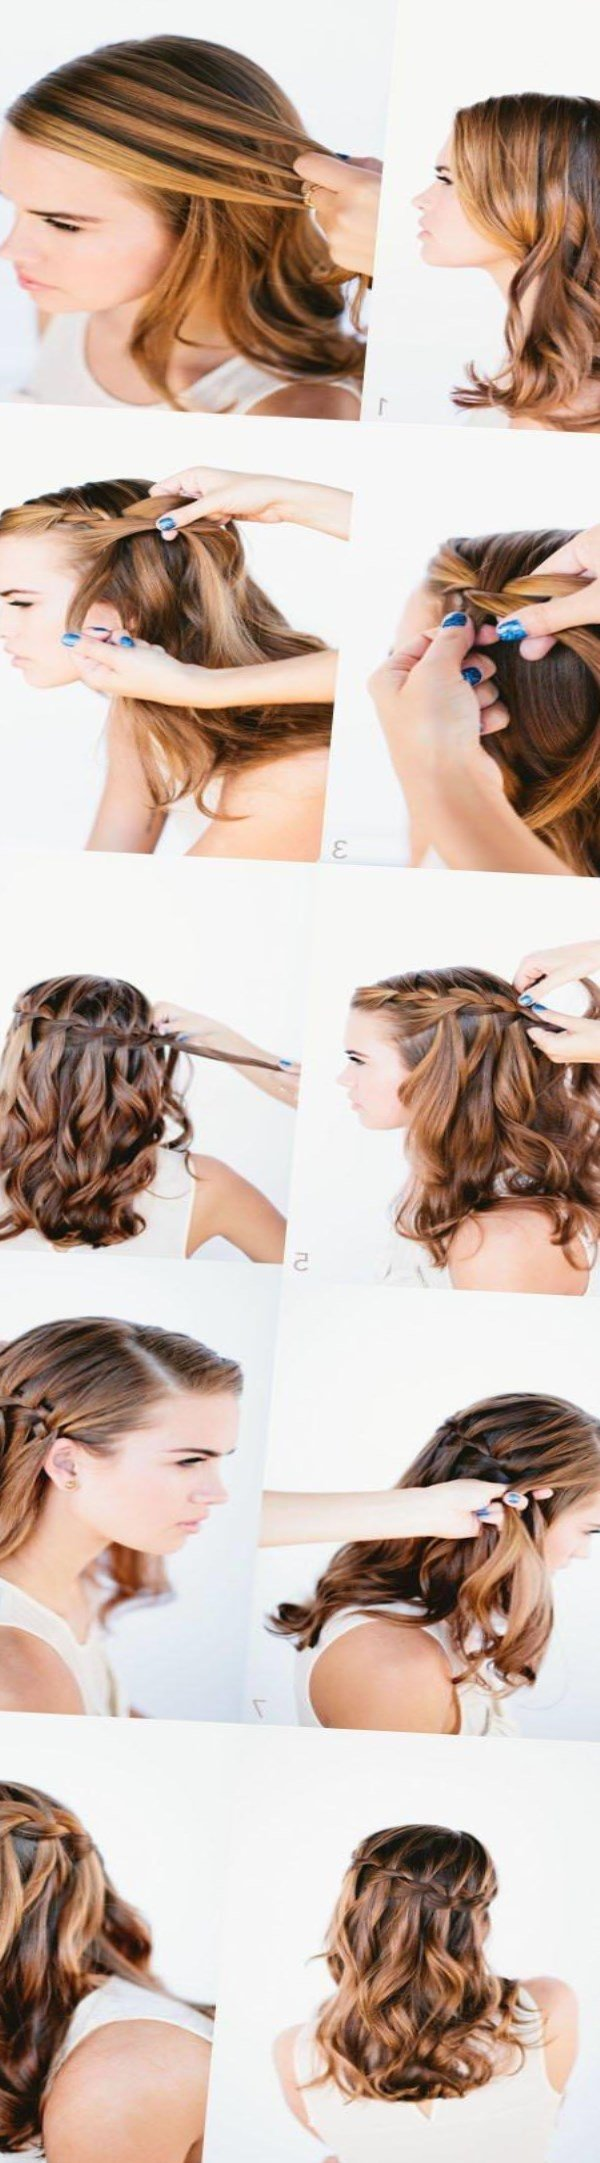 Прически на средние волосы фото схема